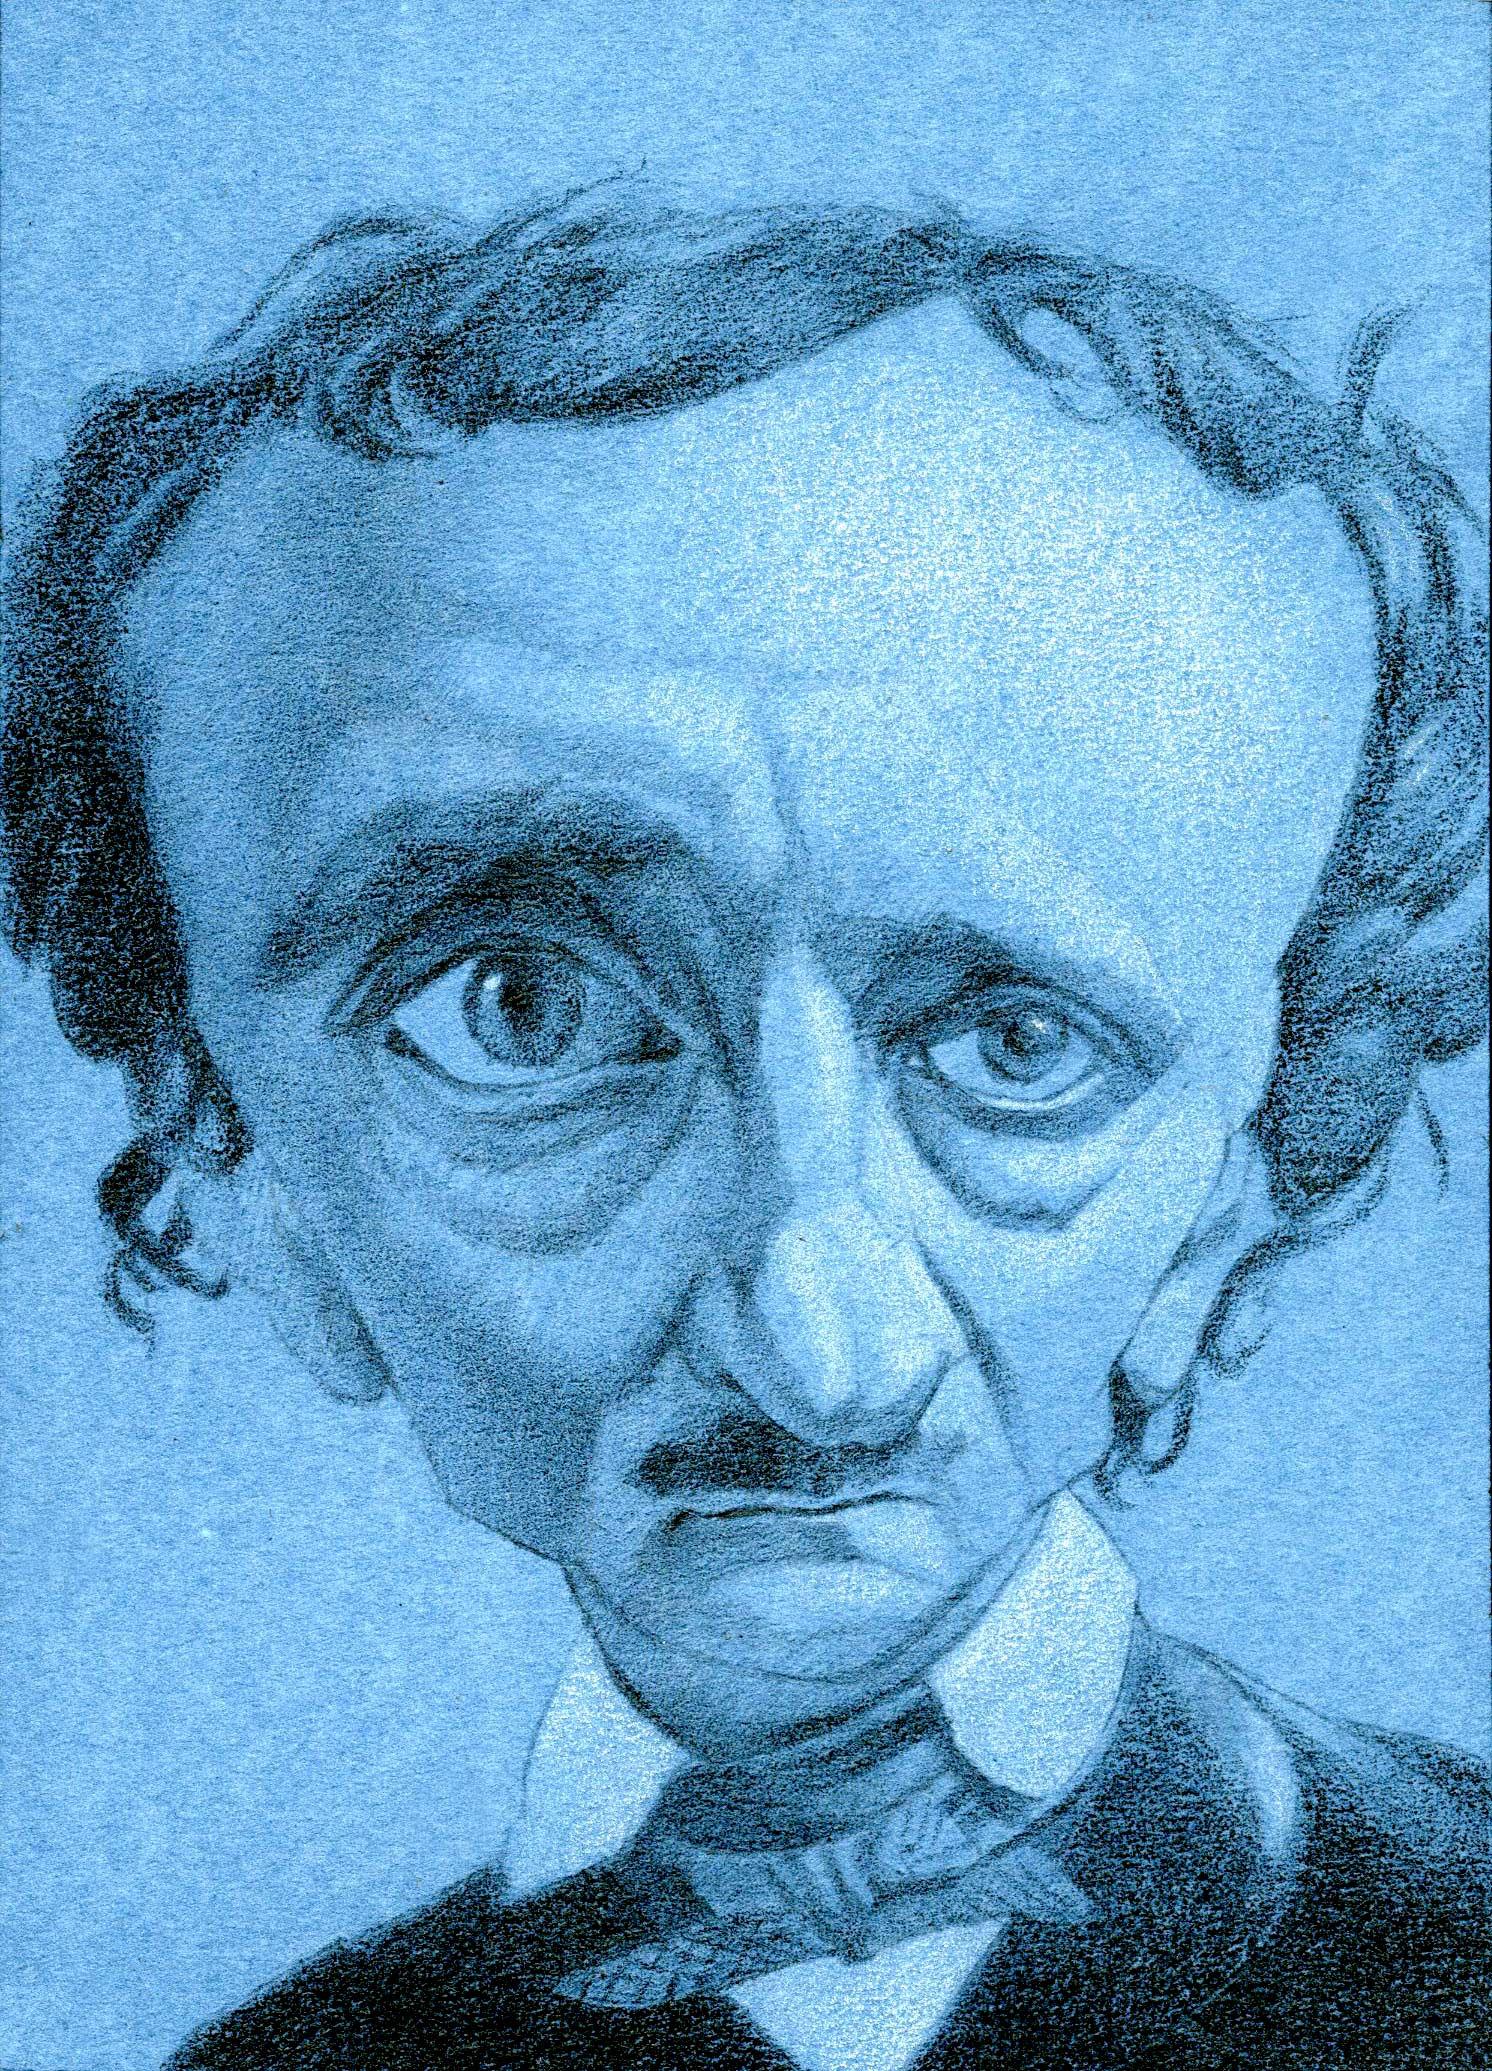 Edgar Allen Poe,  2017  Pencil on paper  5 x 7 iuches